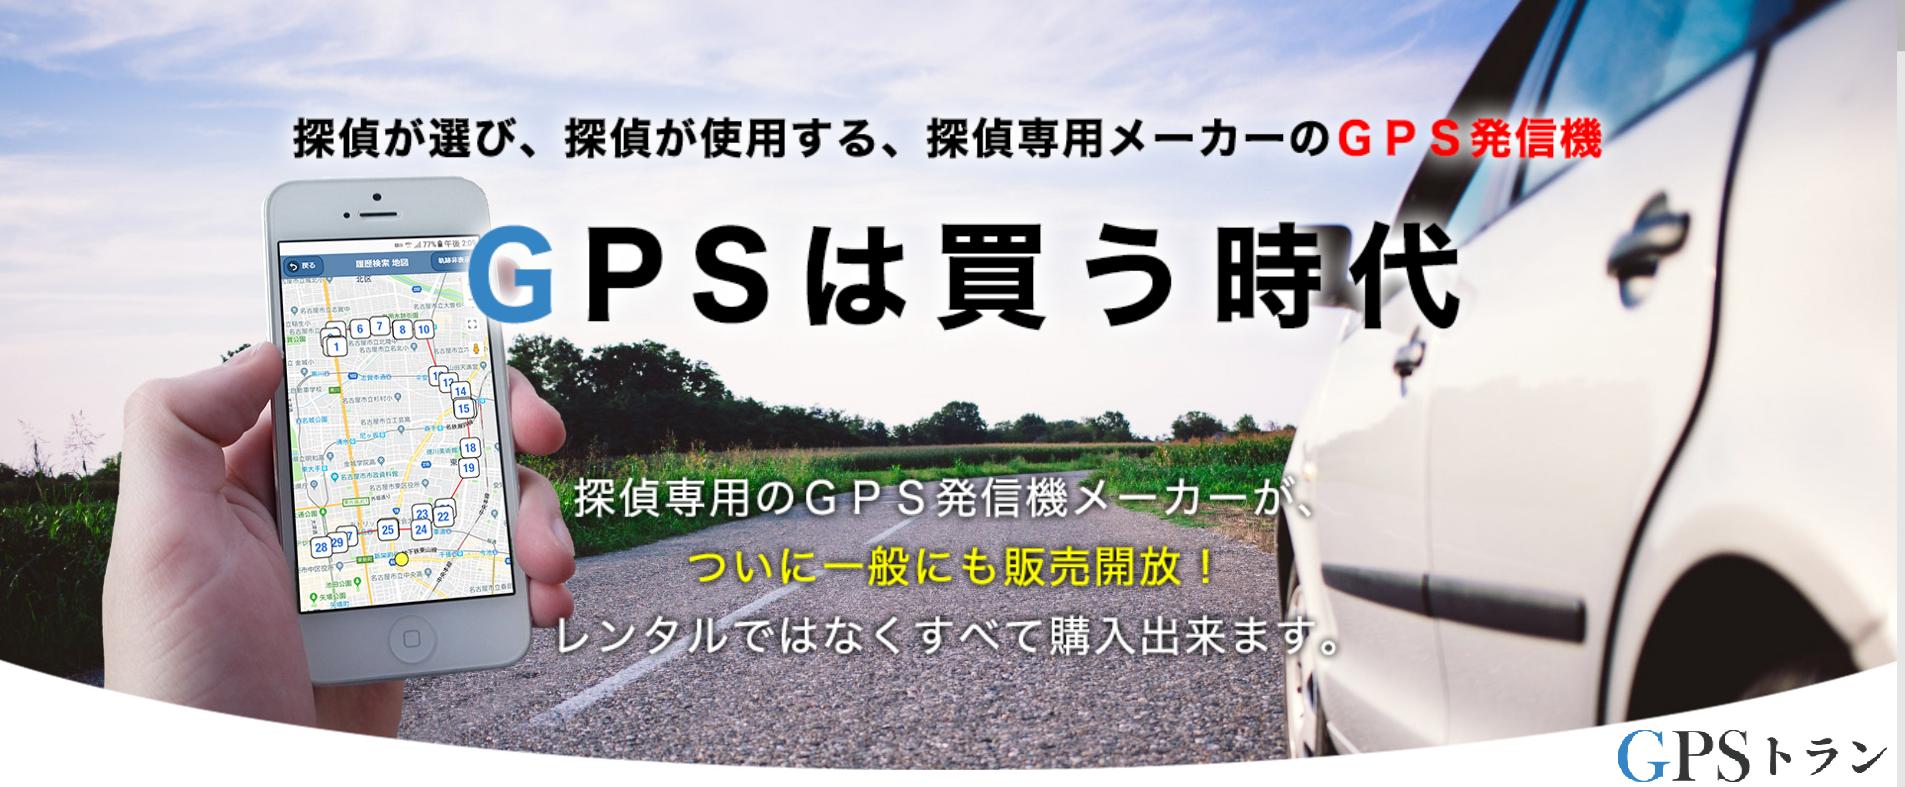 GPSトラン